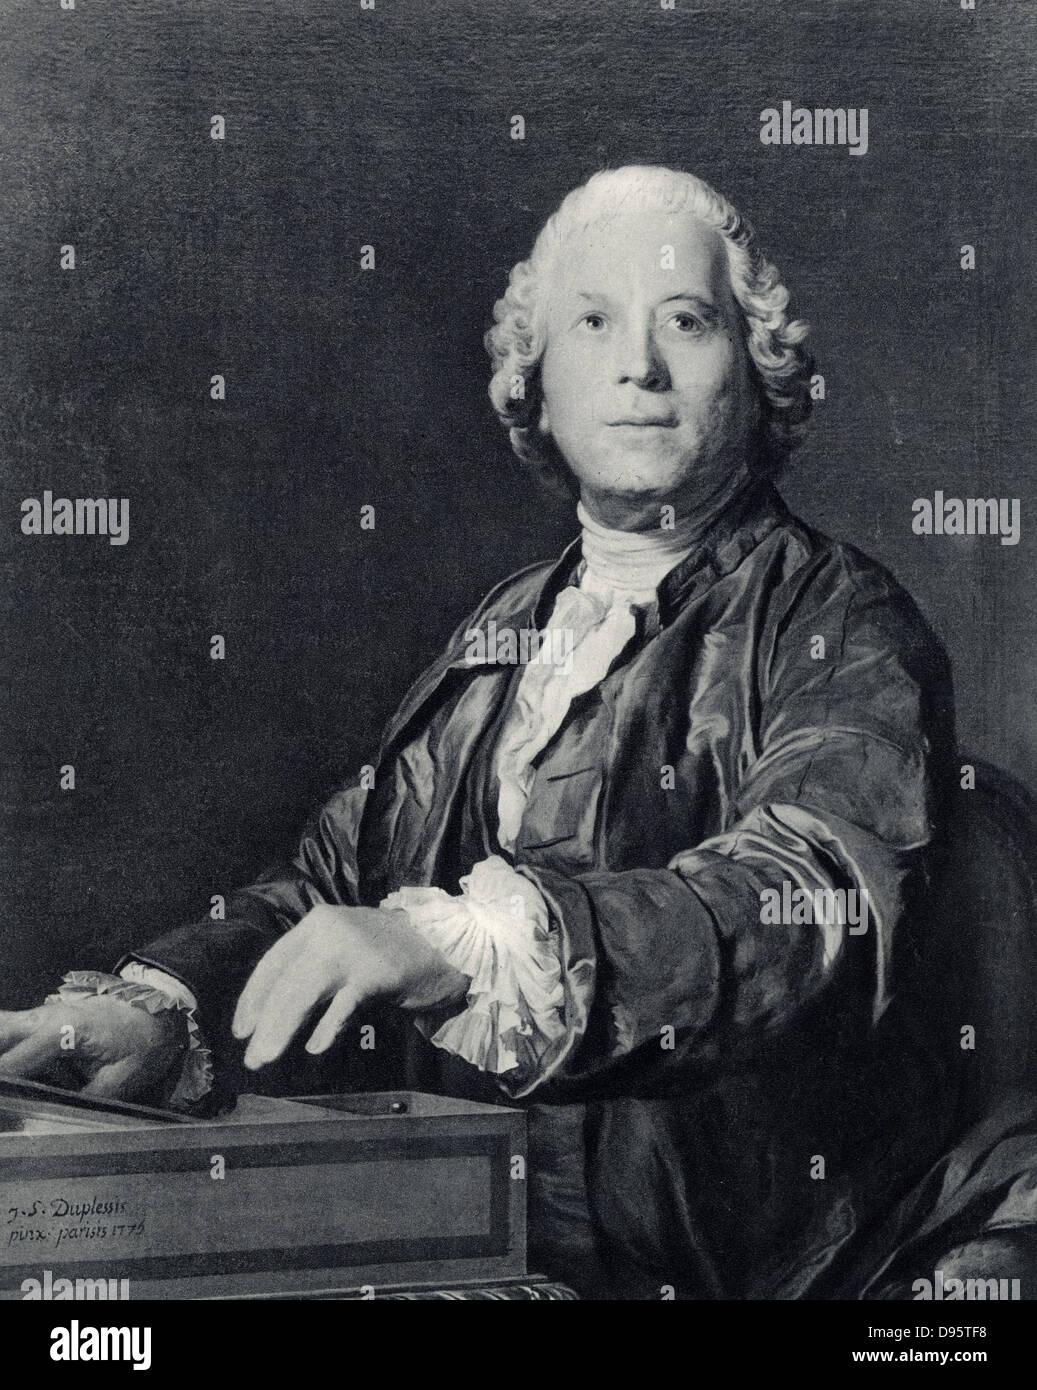 Christoph Willibald Gluck (1714-1787) Bohemian German composer. - Stock Image